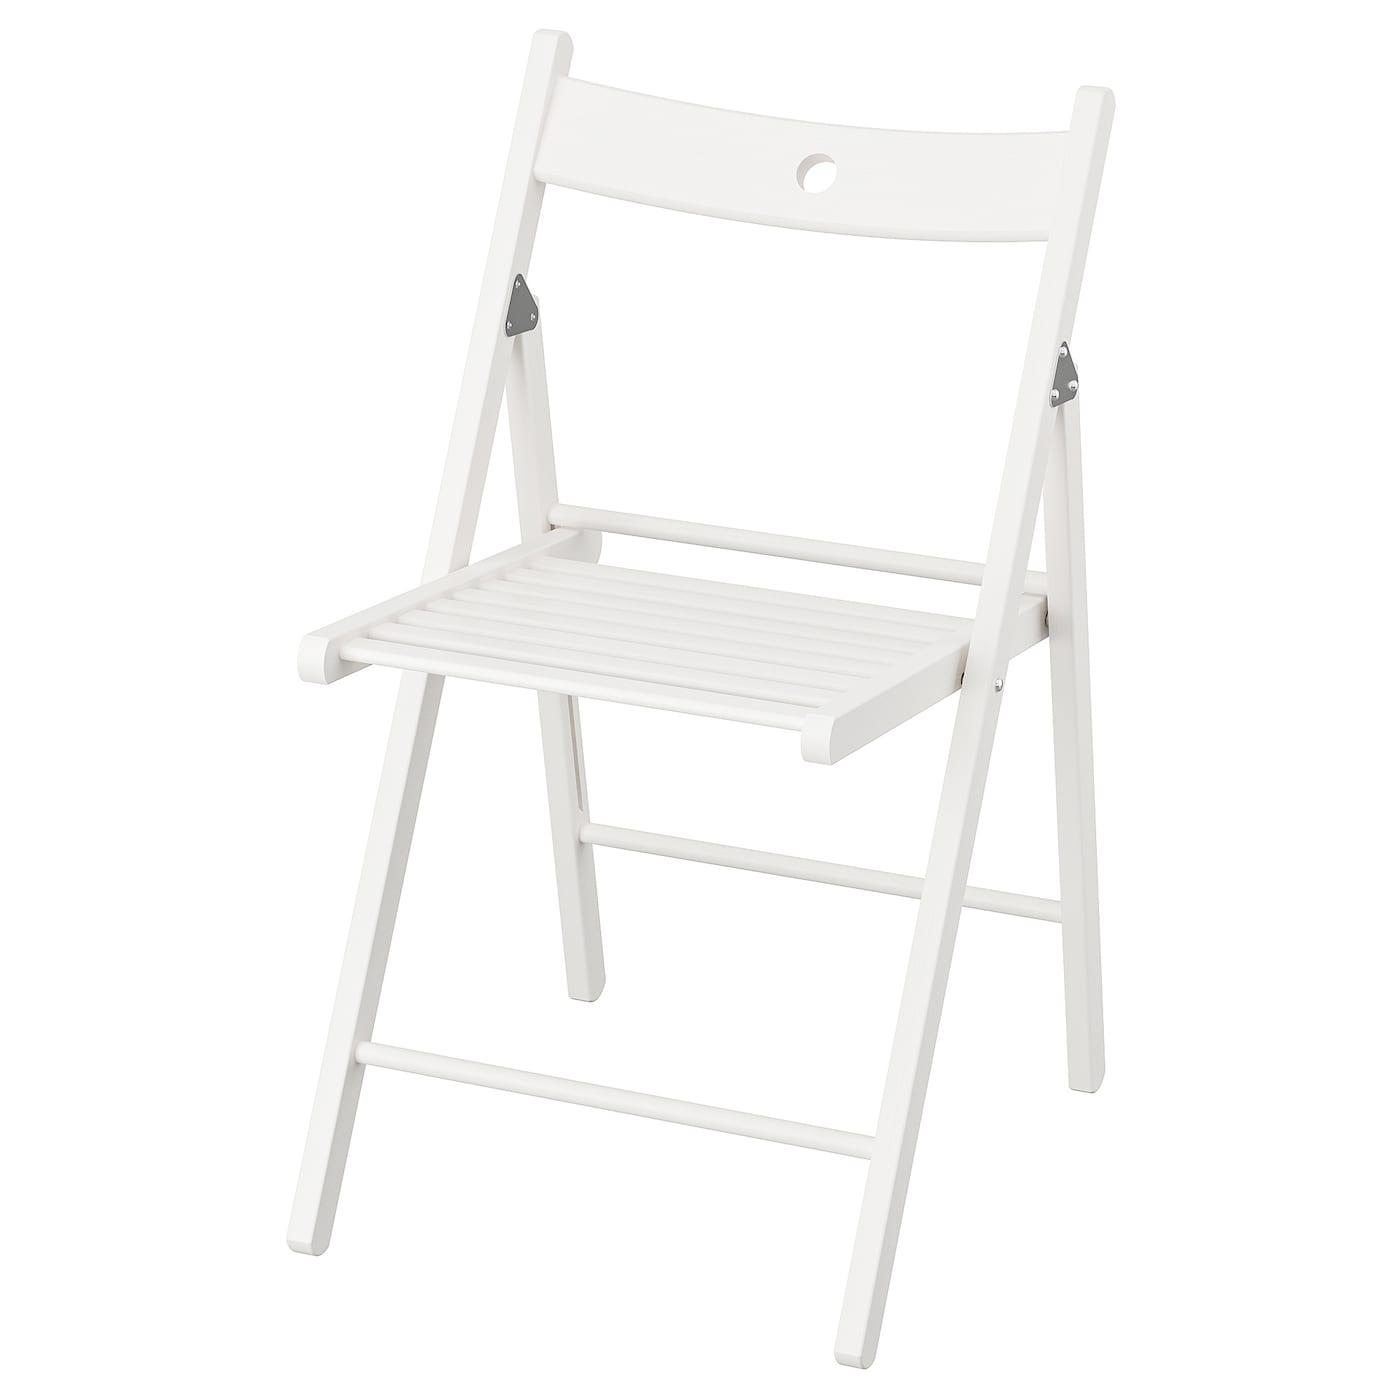 Ikea Terje Klappstuhl in weiß; aus Massivholz